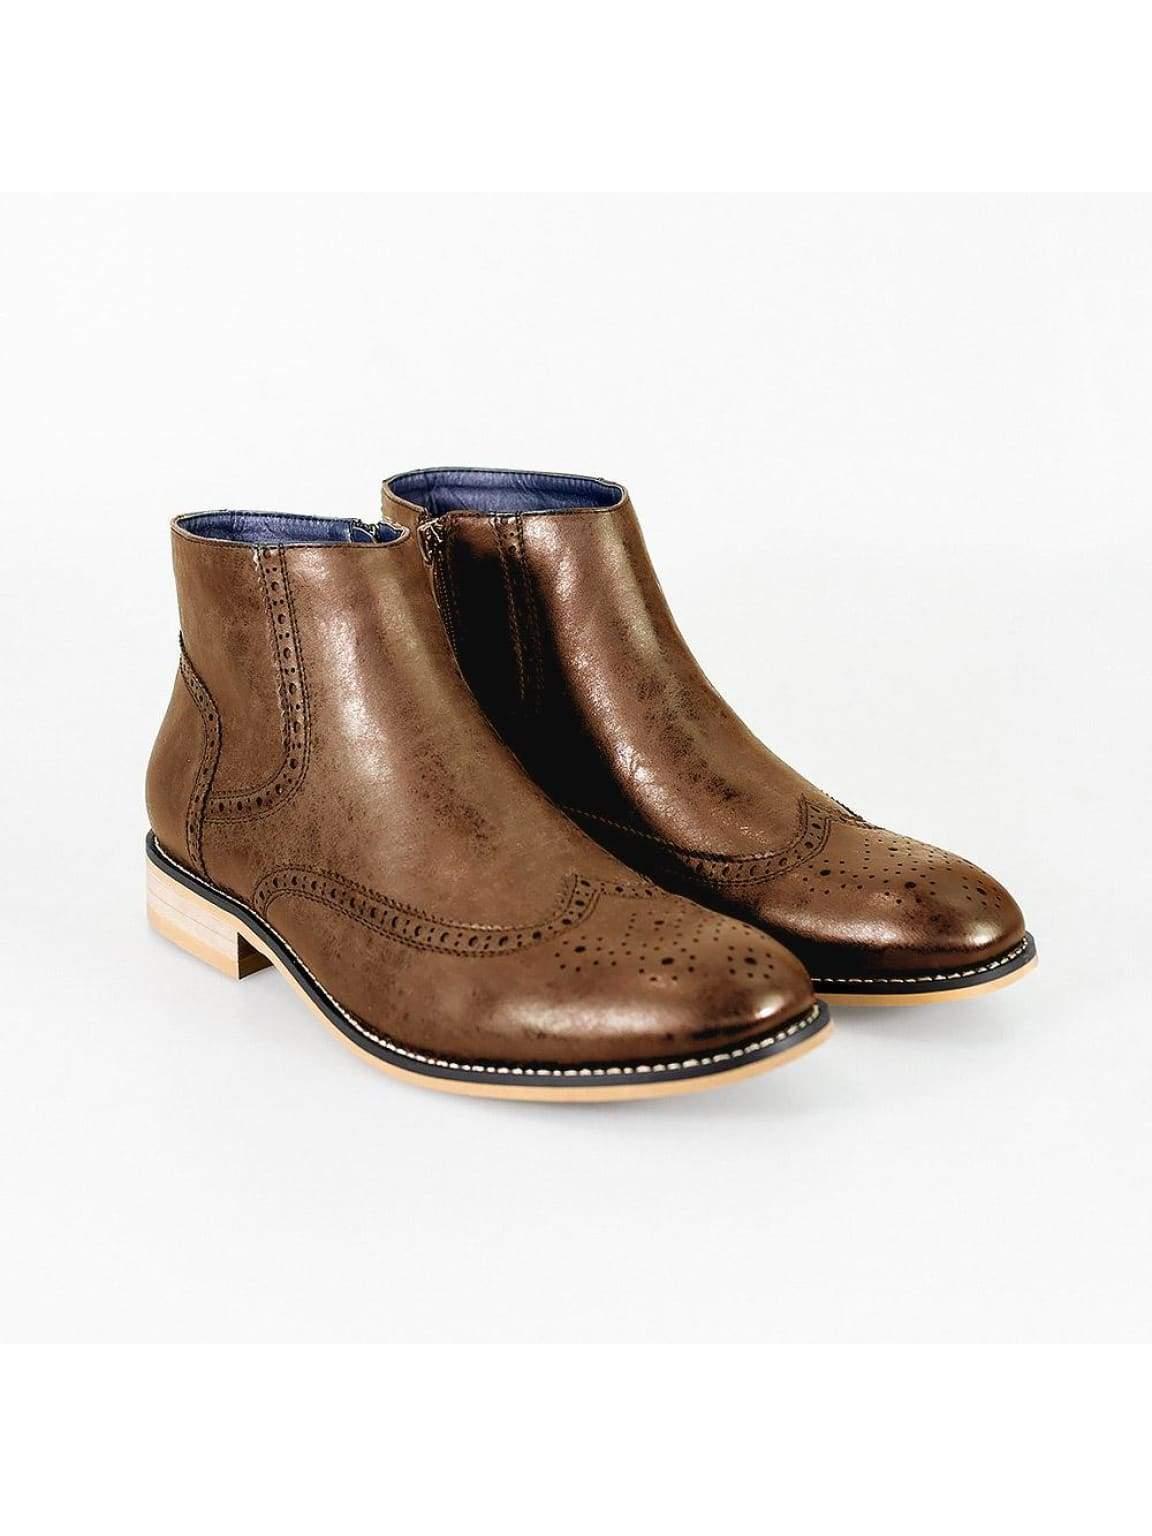 Cavani Westland Tan Mens Leather Boots - UK7   EU41 - Boots